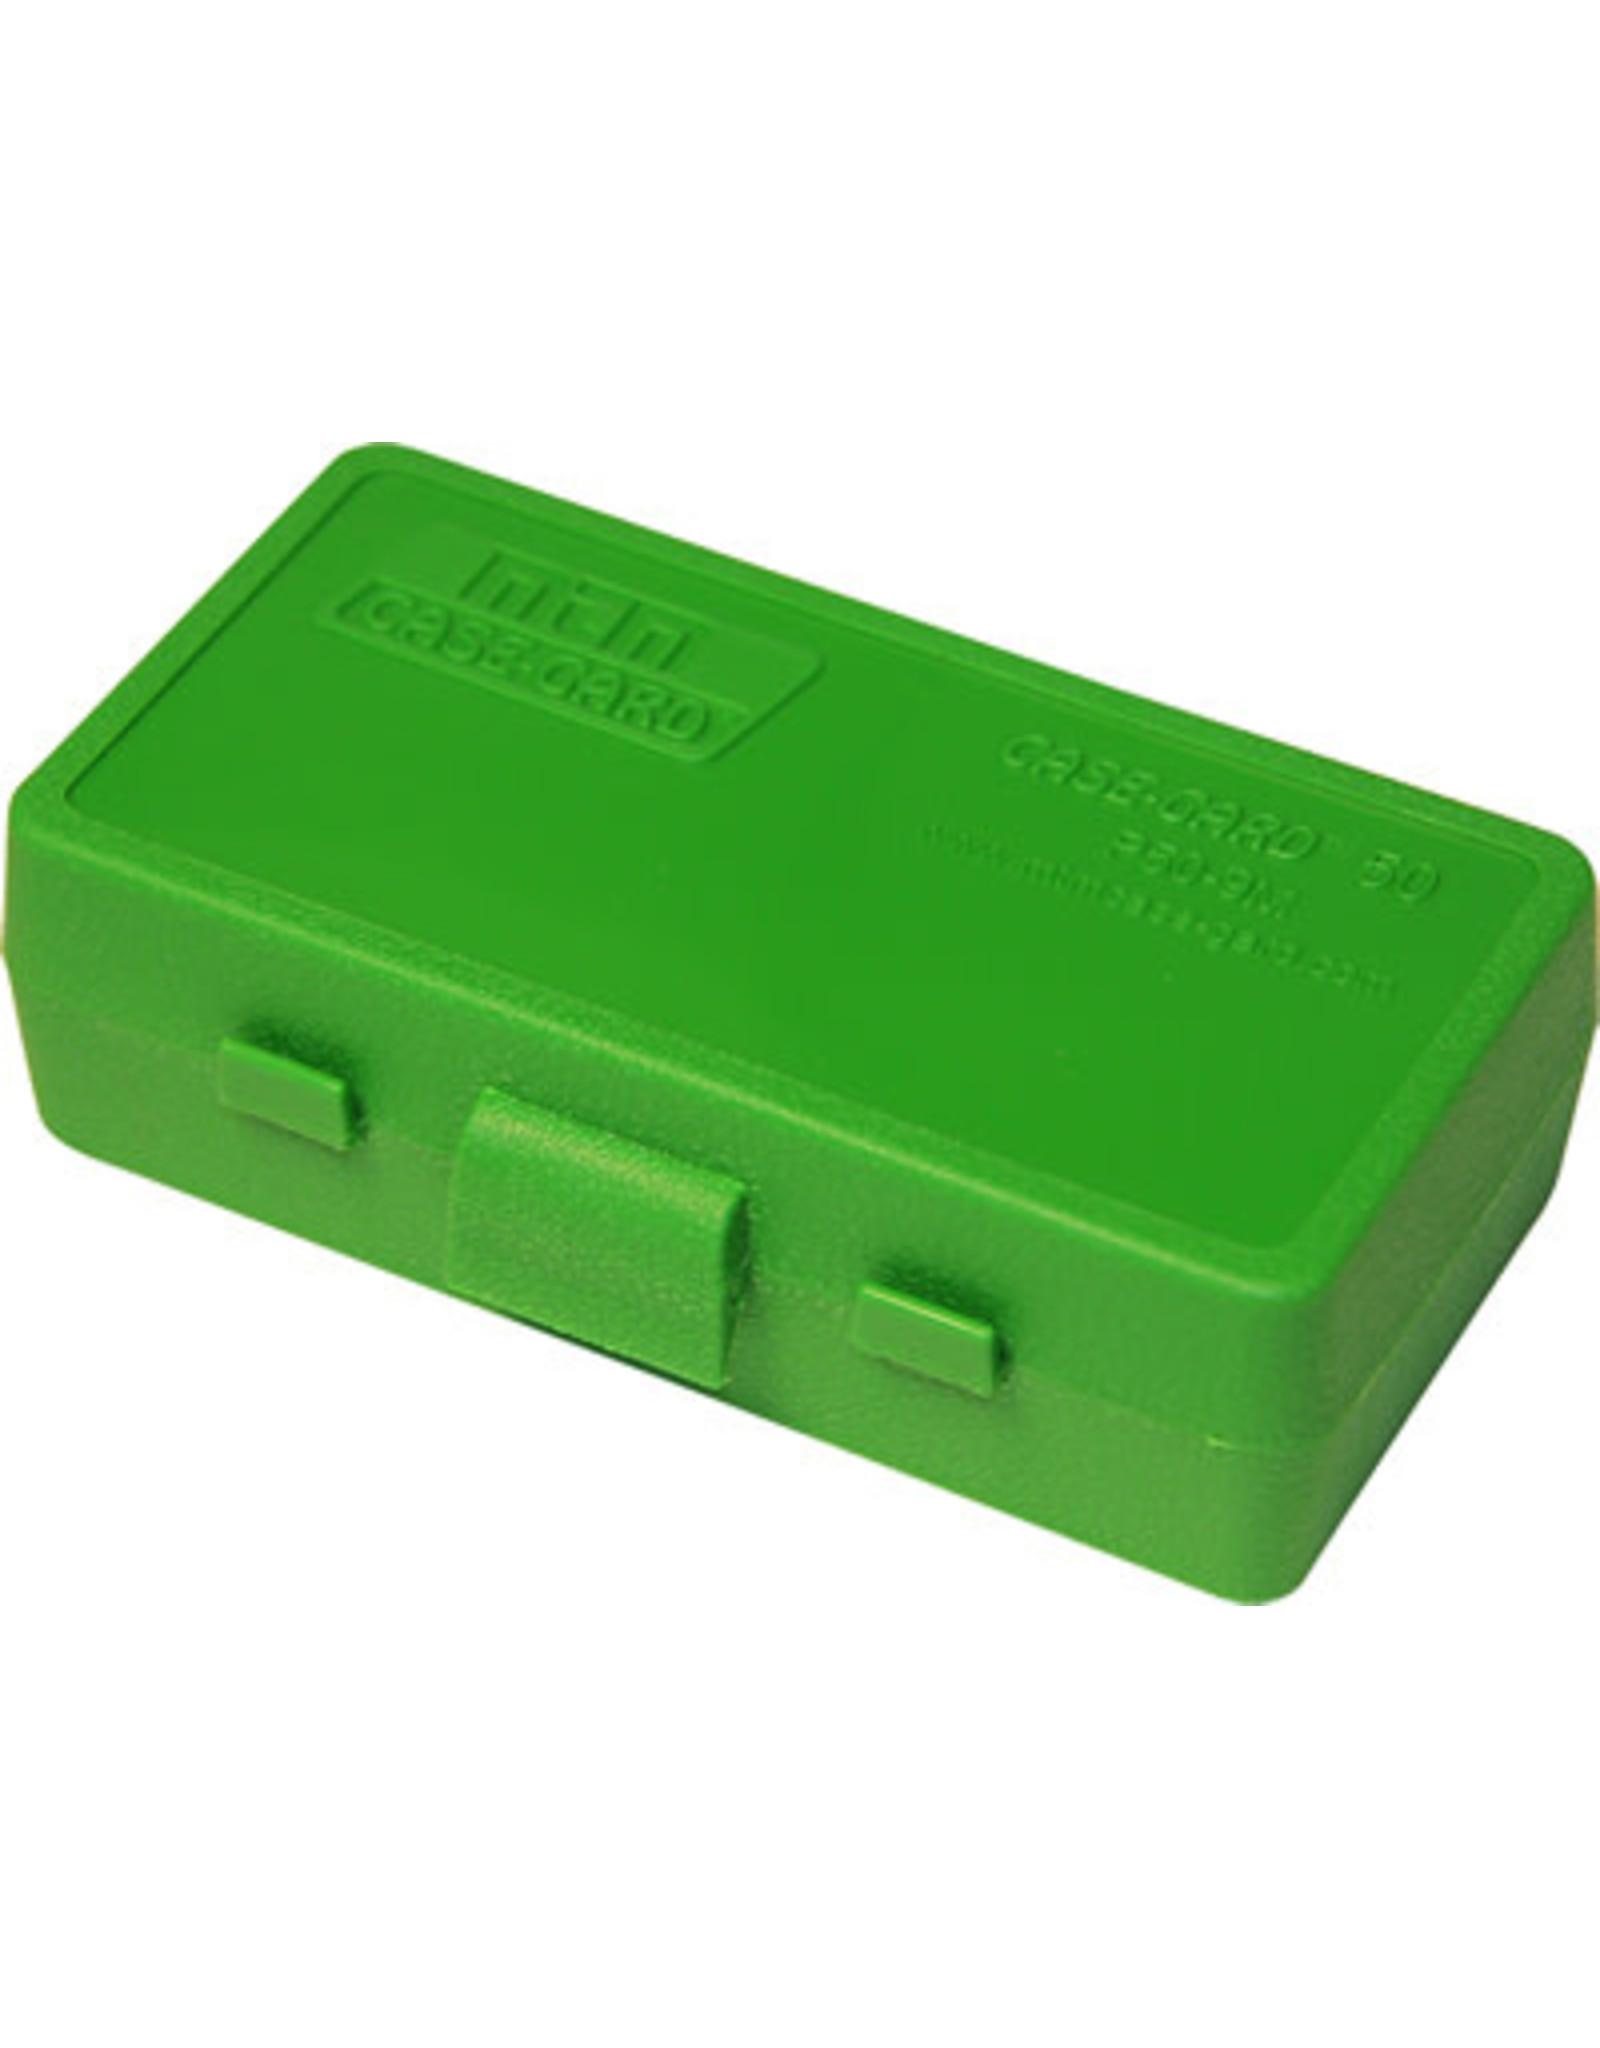 MTM Case-Gard MTM P50-44-10 CASE-GUARD AMMO BOX 50